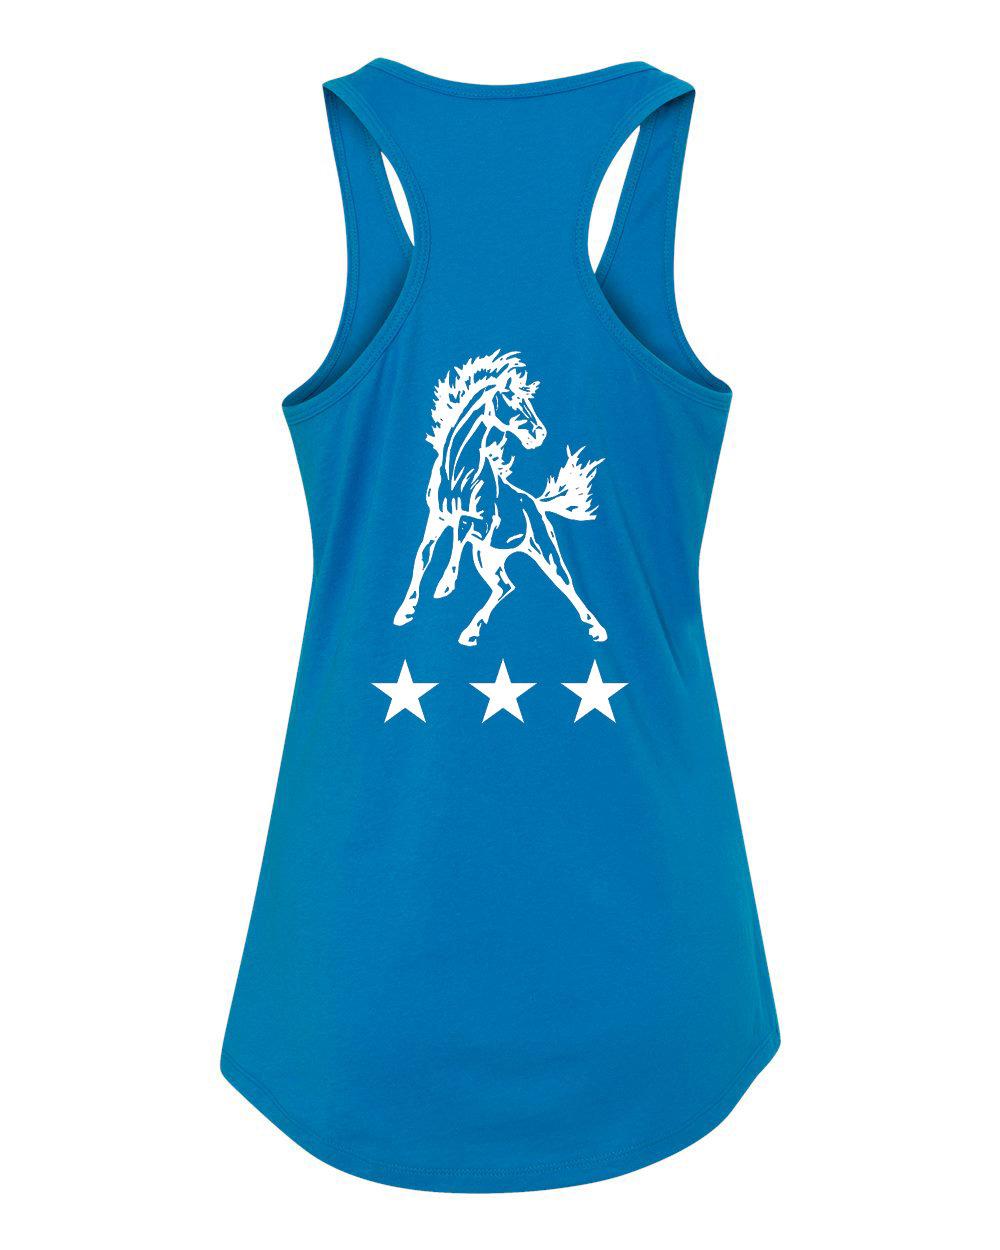 Ladies Blue Horse Racerback Tank RACERBACKTNK_BIN10